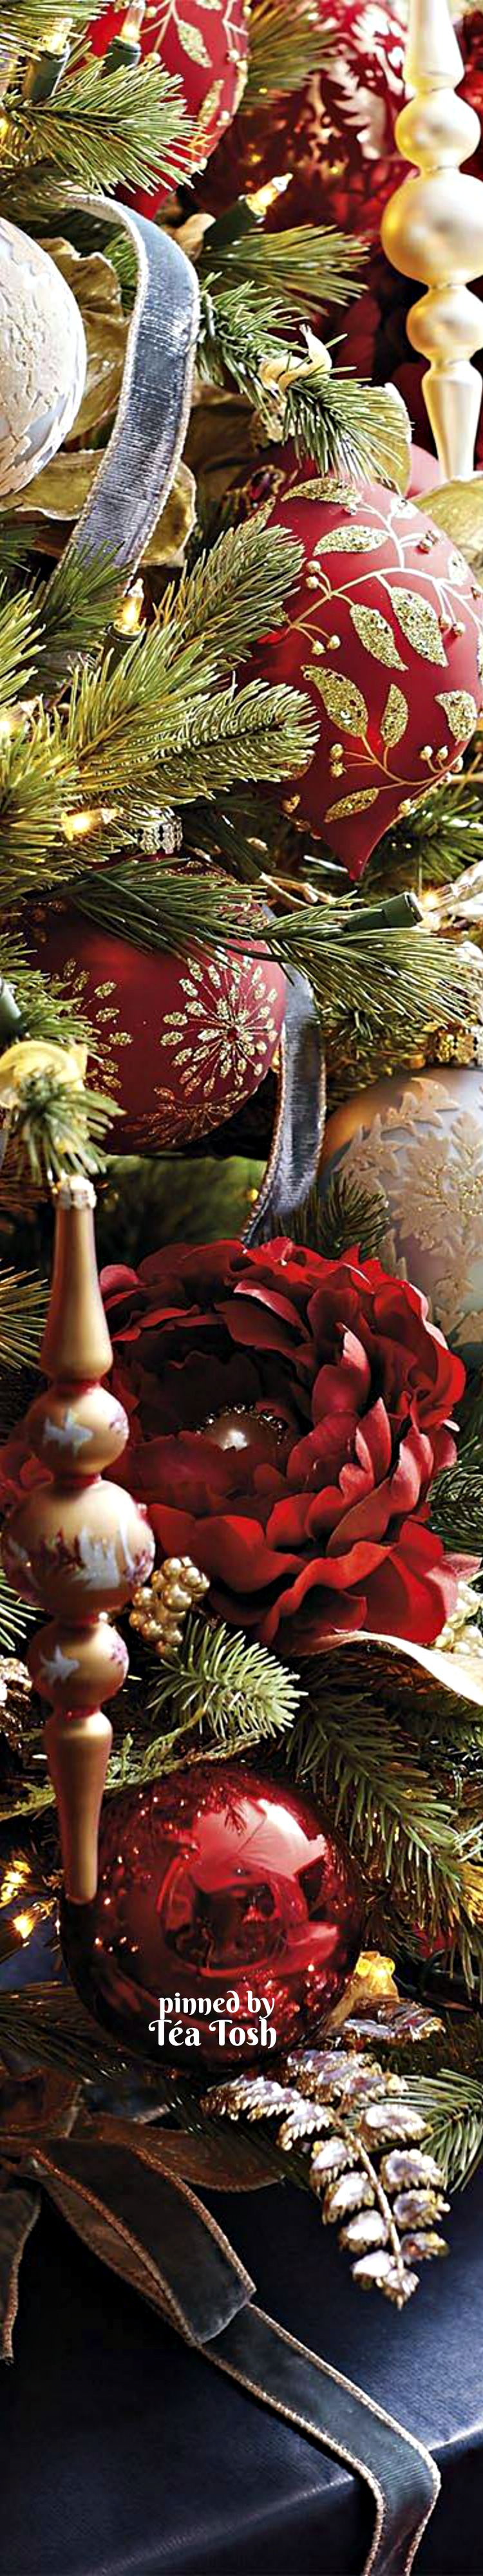 Hollyus christmas open house téa tosh christmas ornament